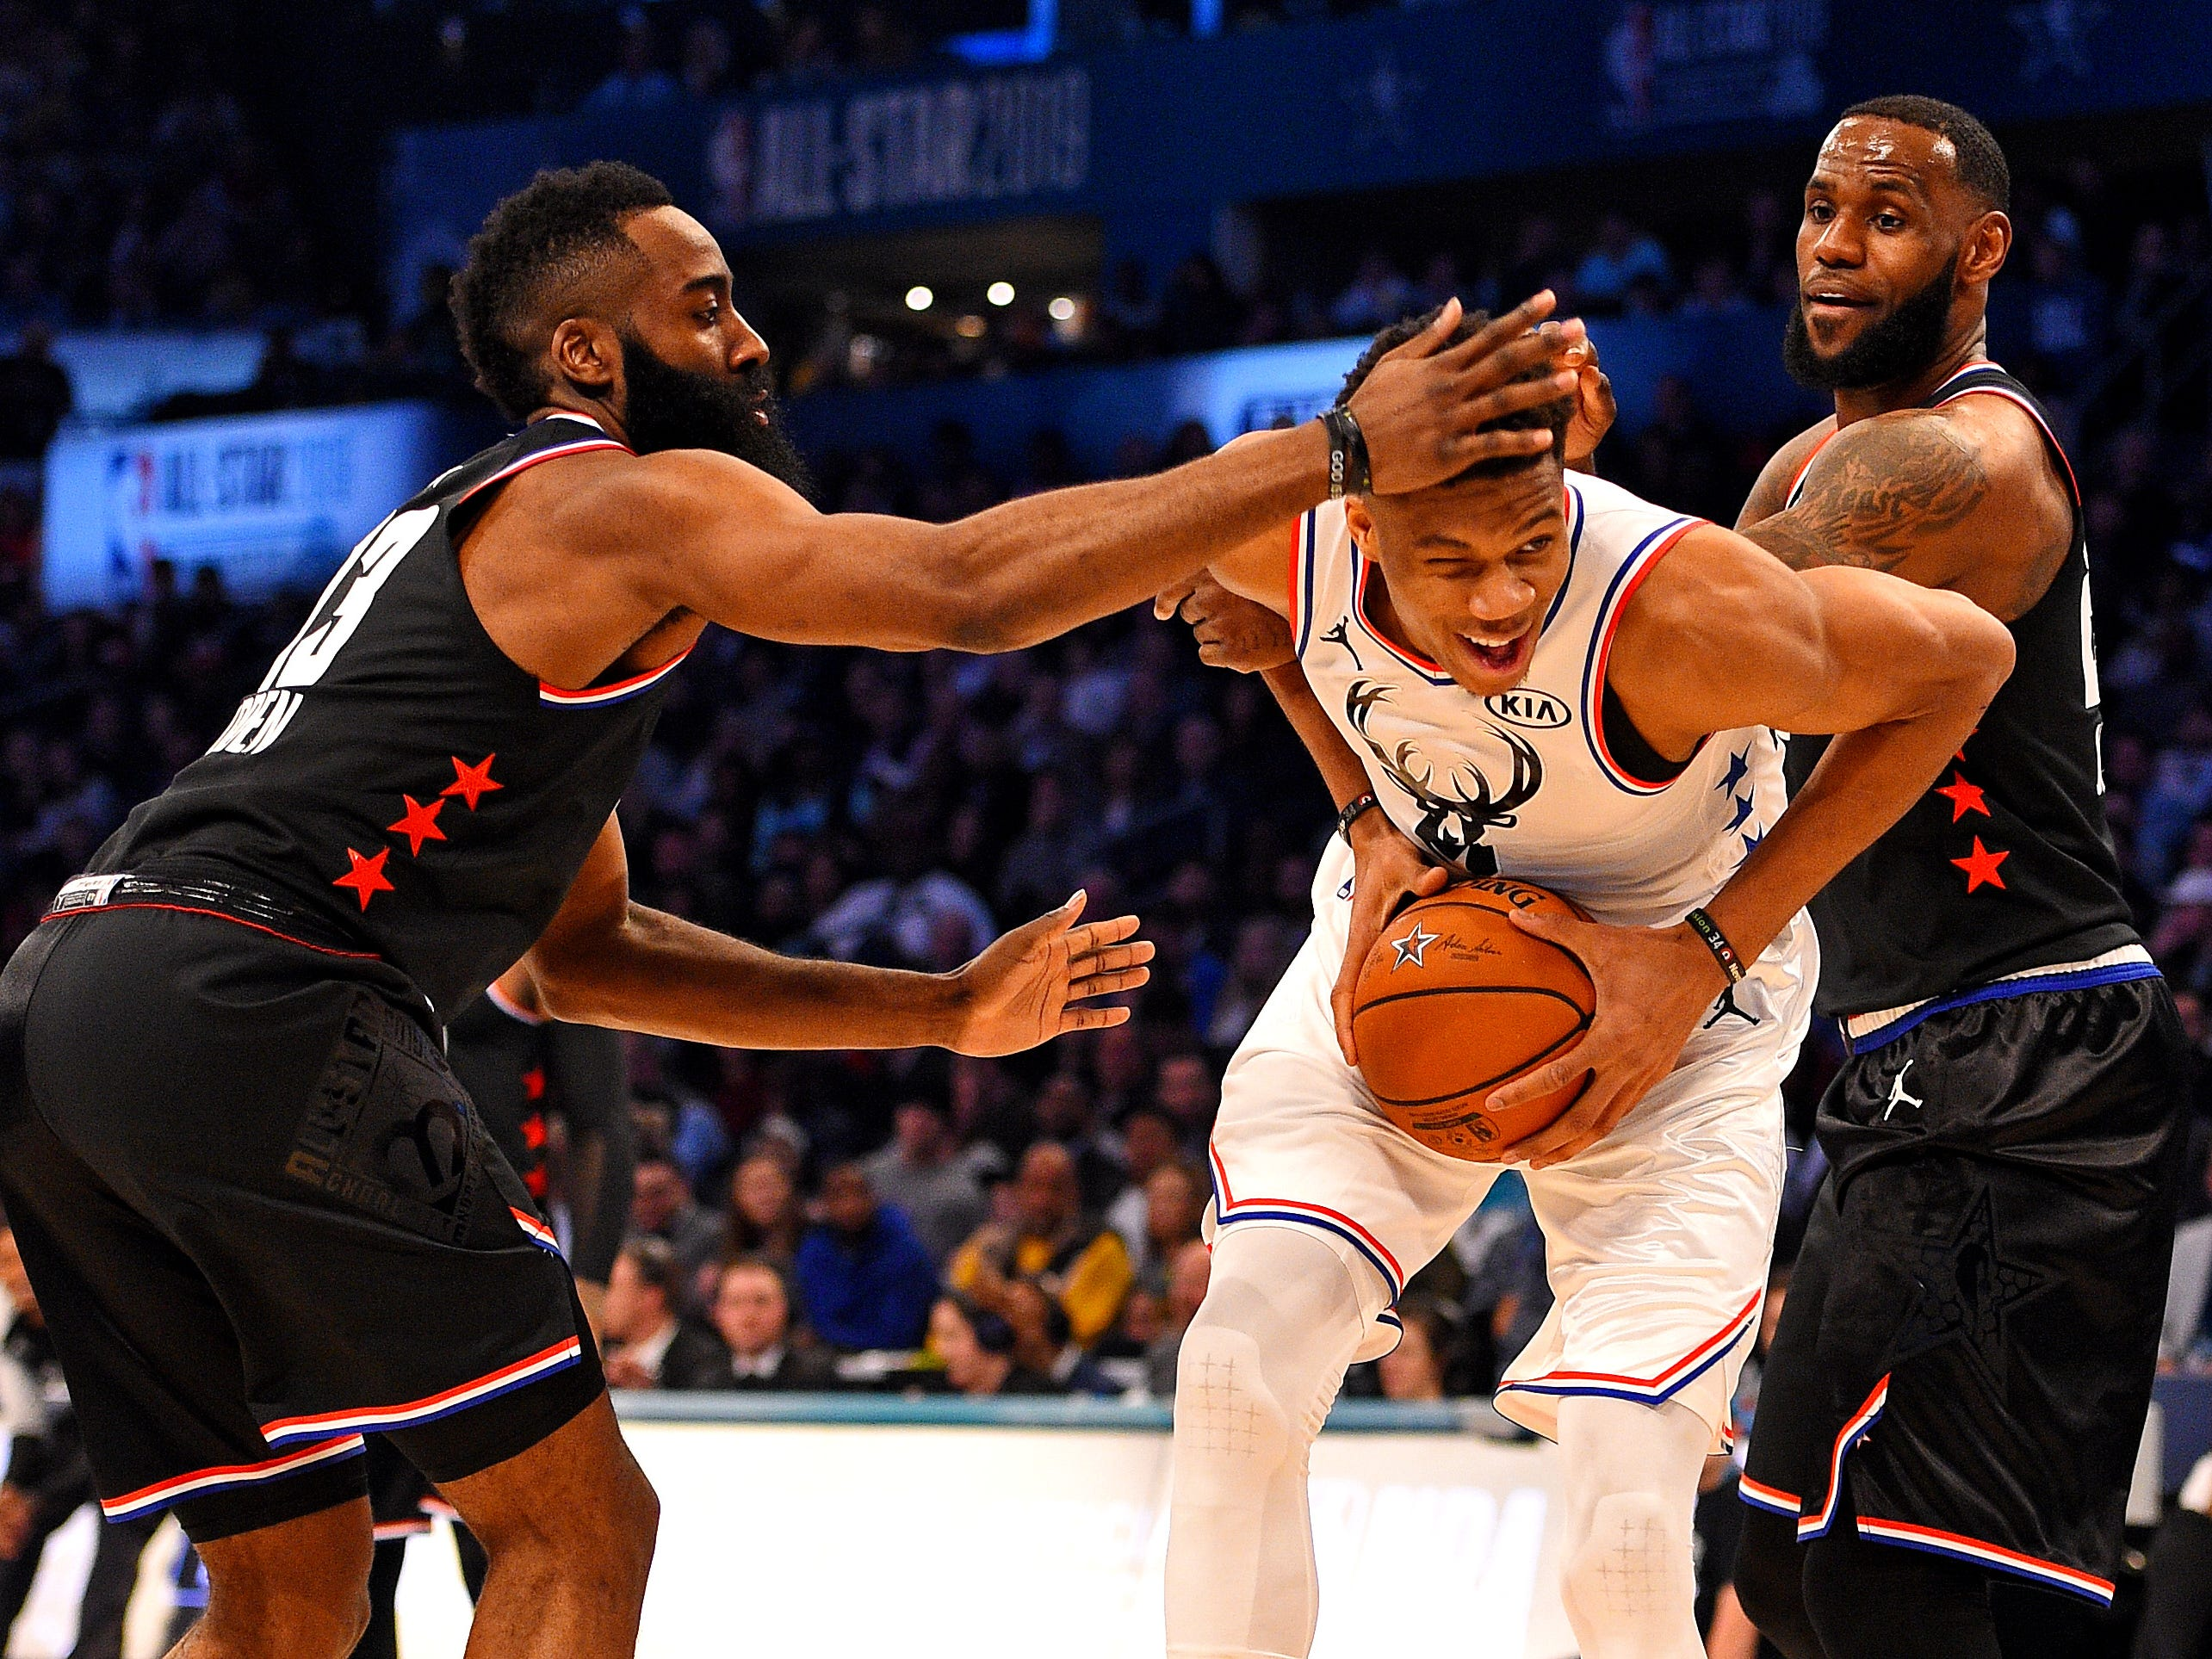 Giannis Antetokounmpo tries to split the defense of  James Harden and LeBron James on Sunday night.